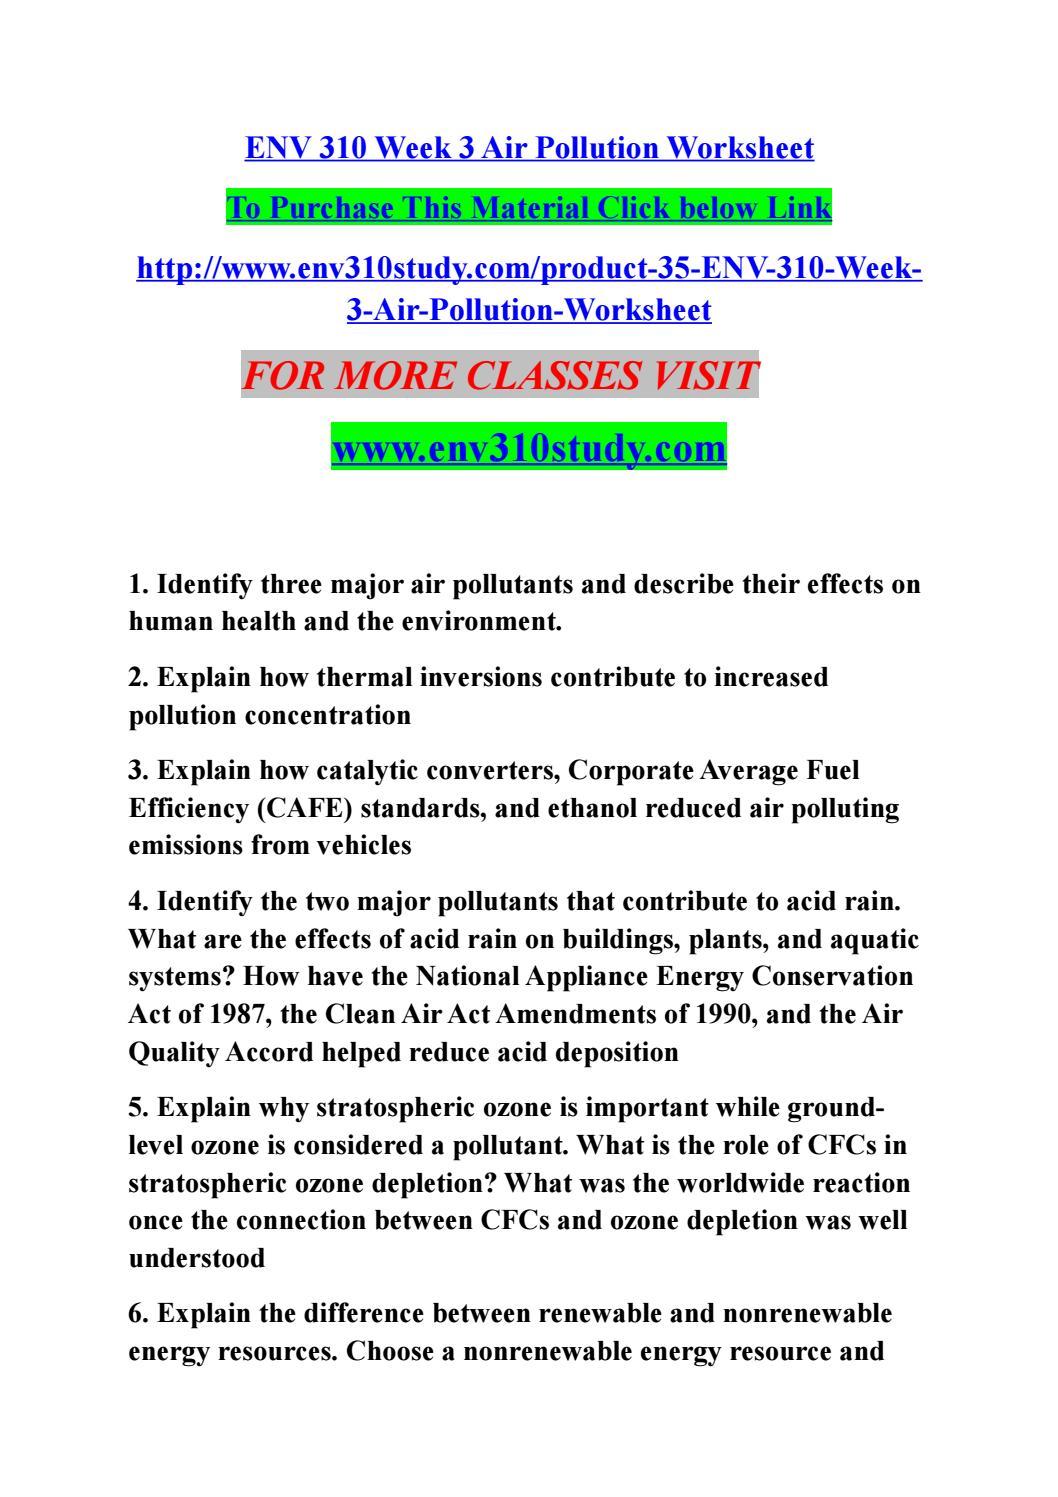 Worksheets Renewable And Nonrenewable Resources Worksheets env 310 week 3 air pollution worksheet by remo2b issuu